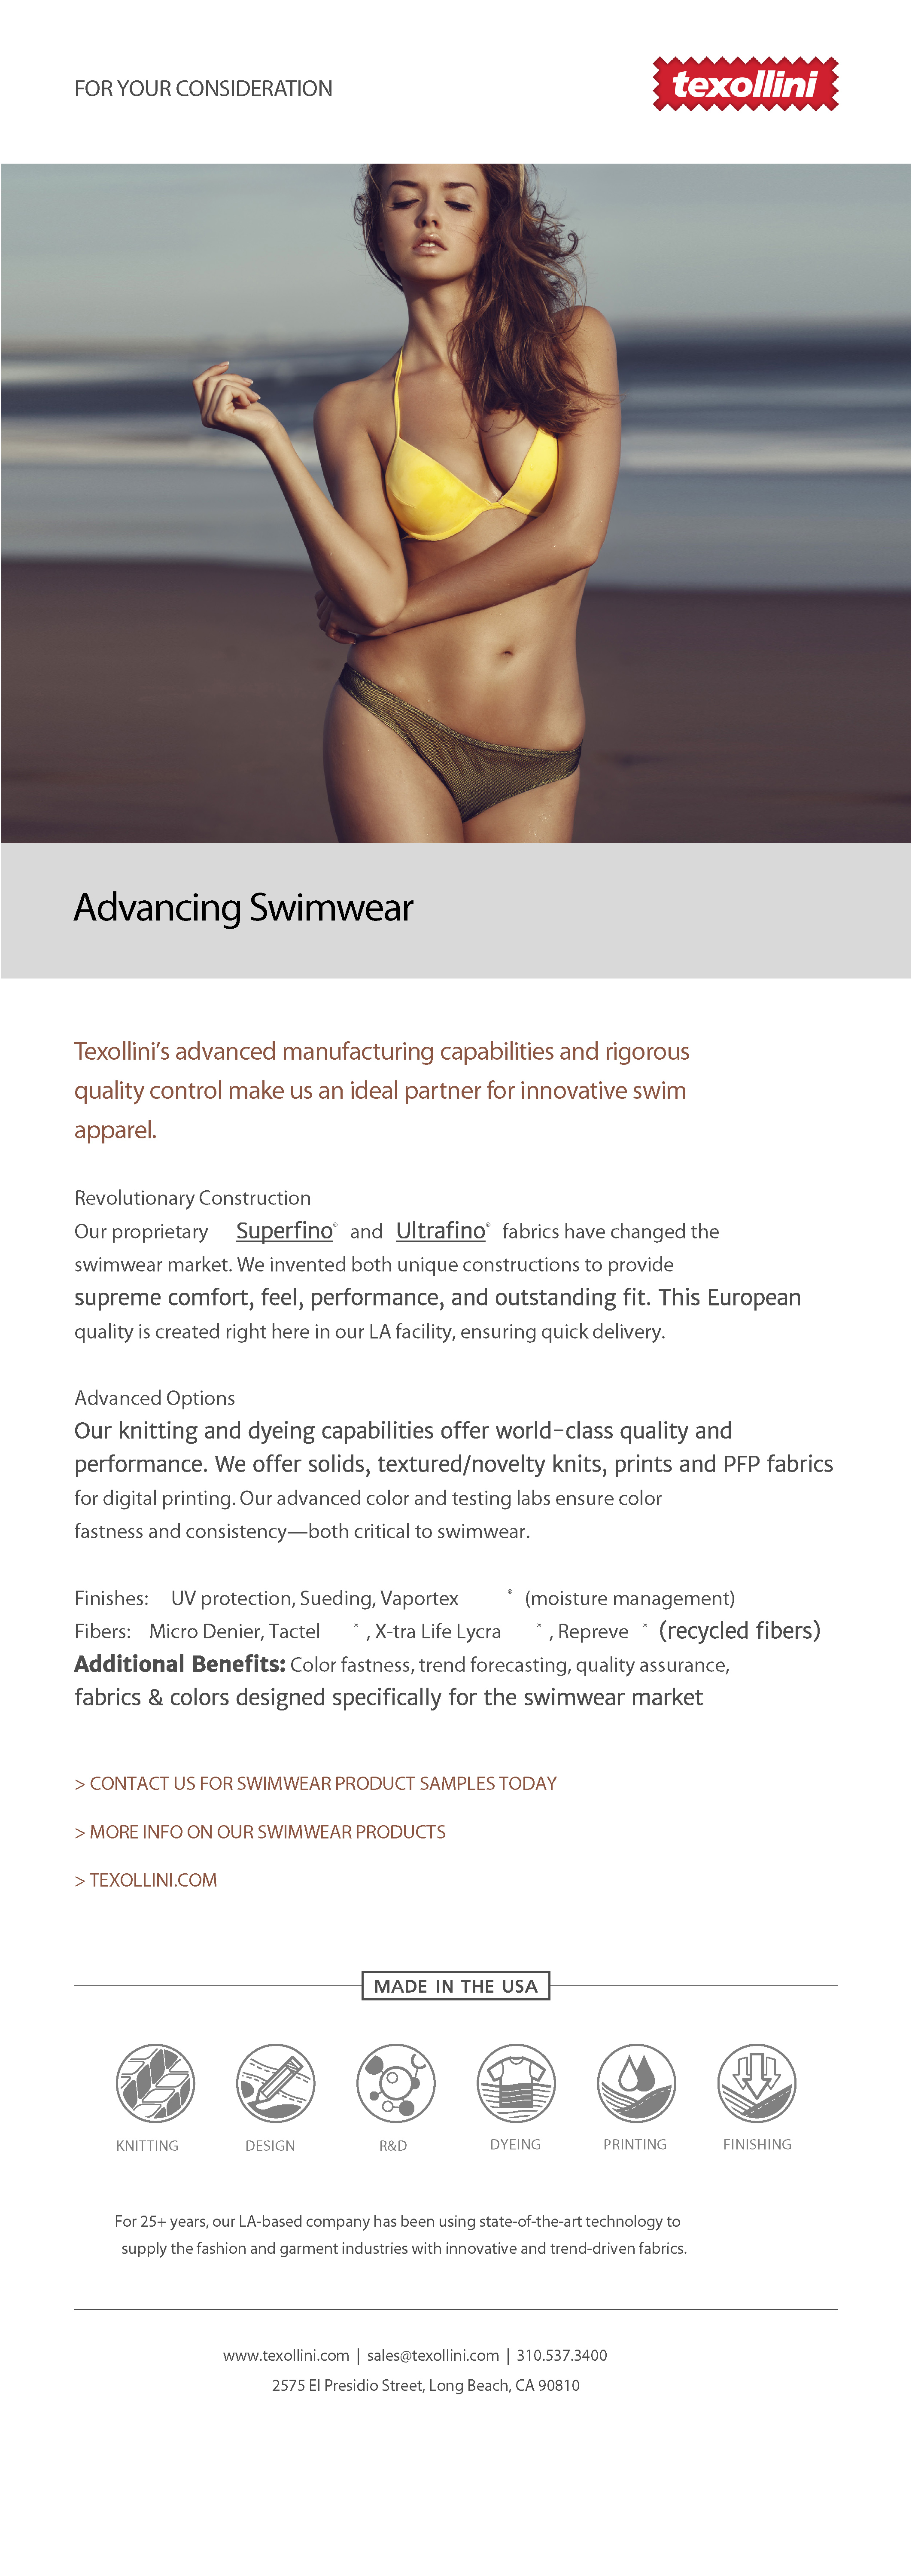 2) 8080-26 TX Email (Swim)